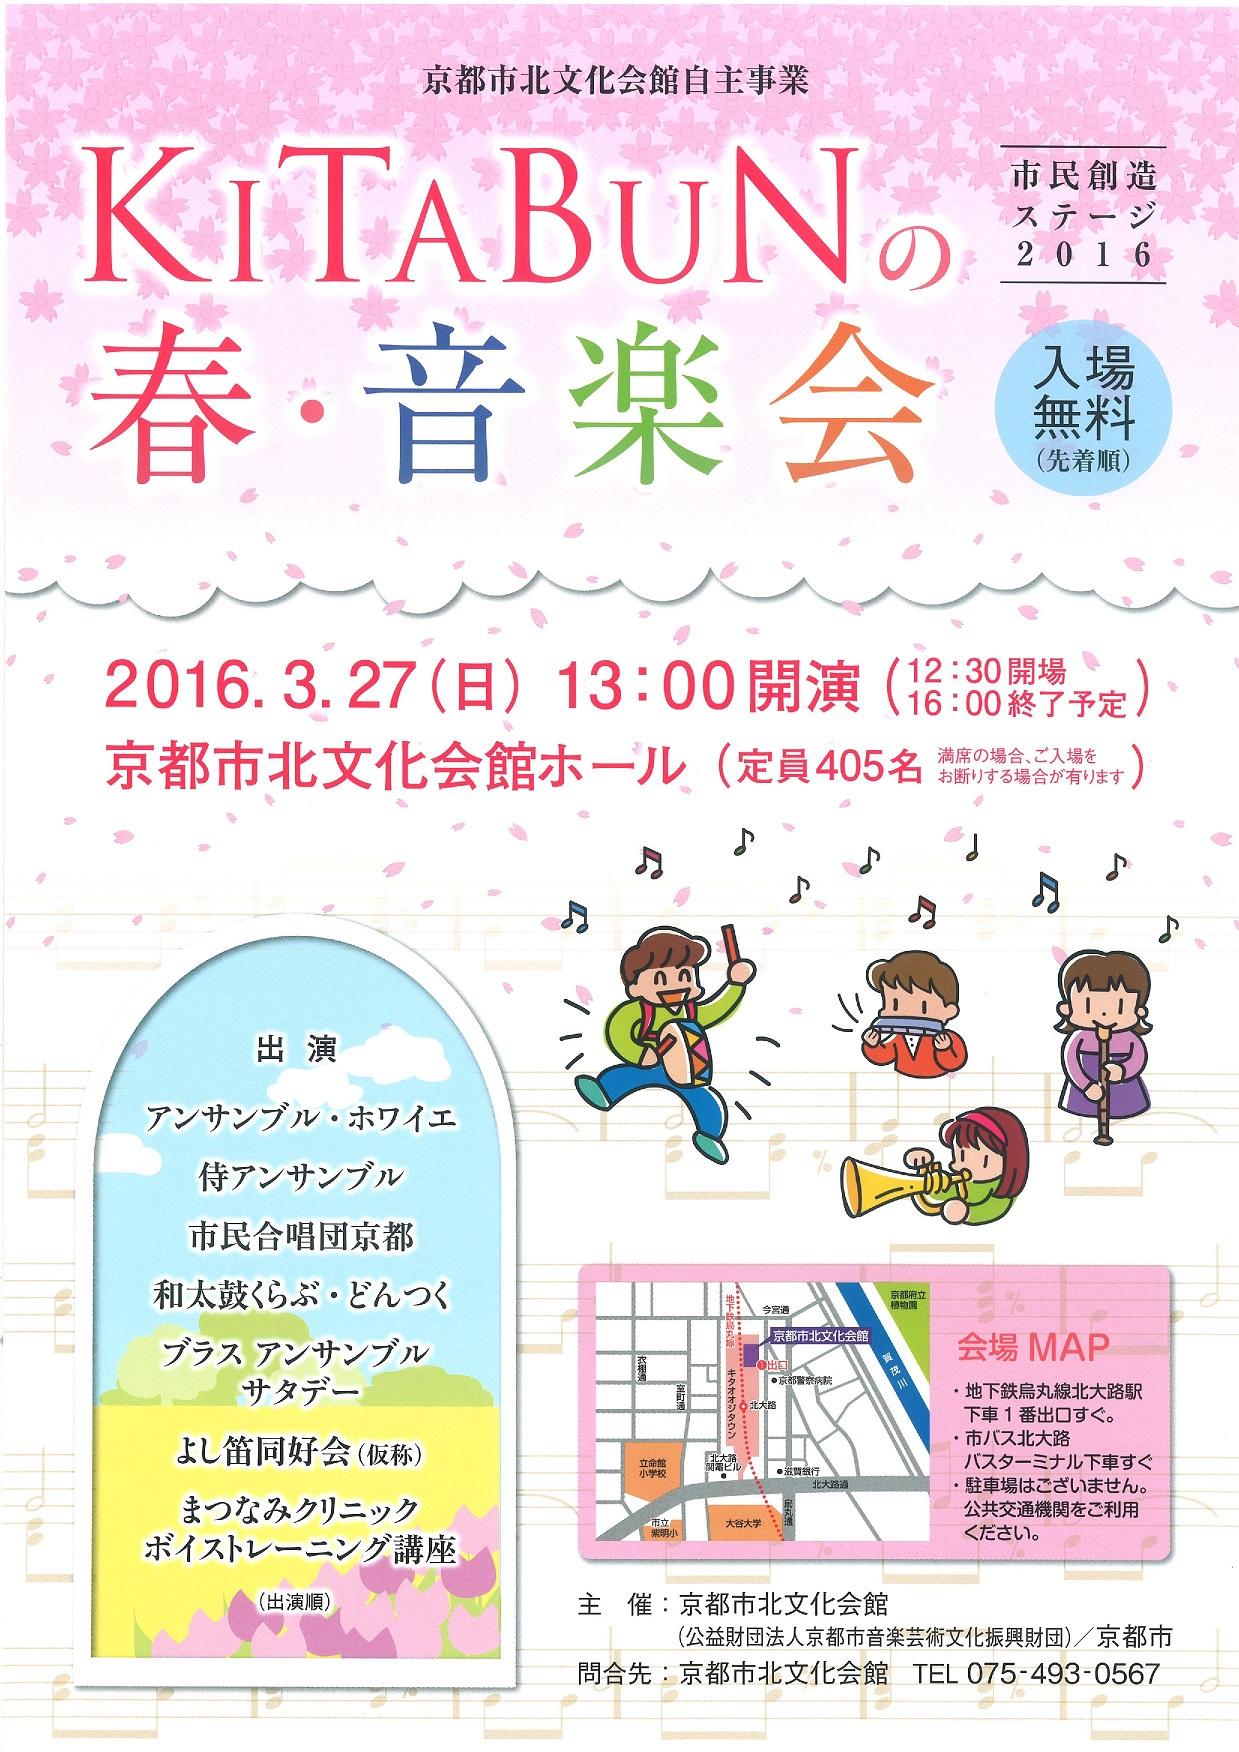 『KITABUNの春・音楽会2016』に出演します